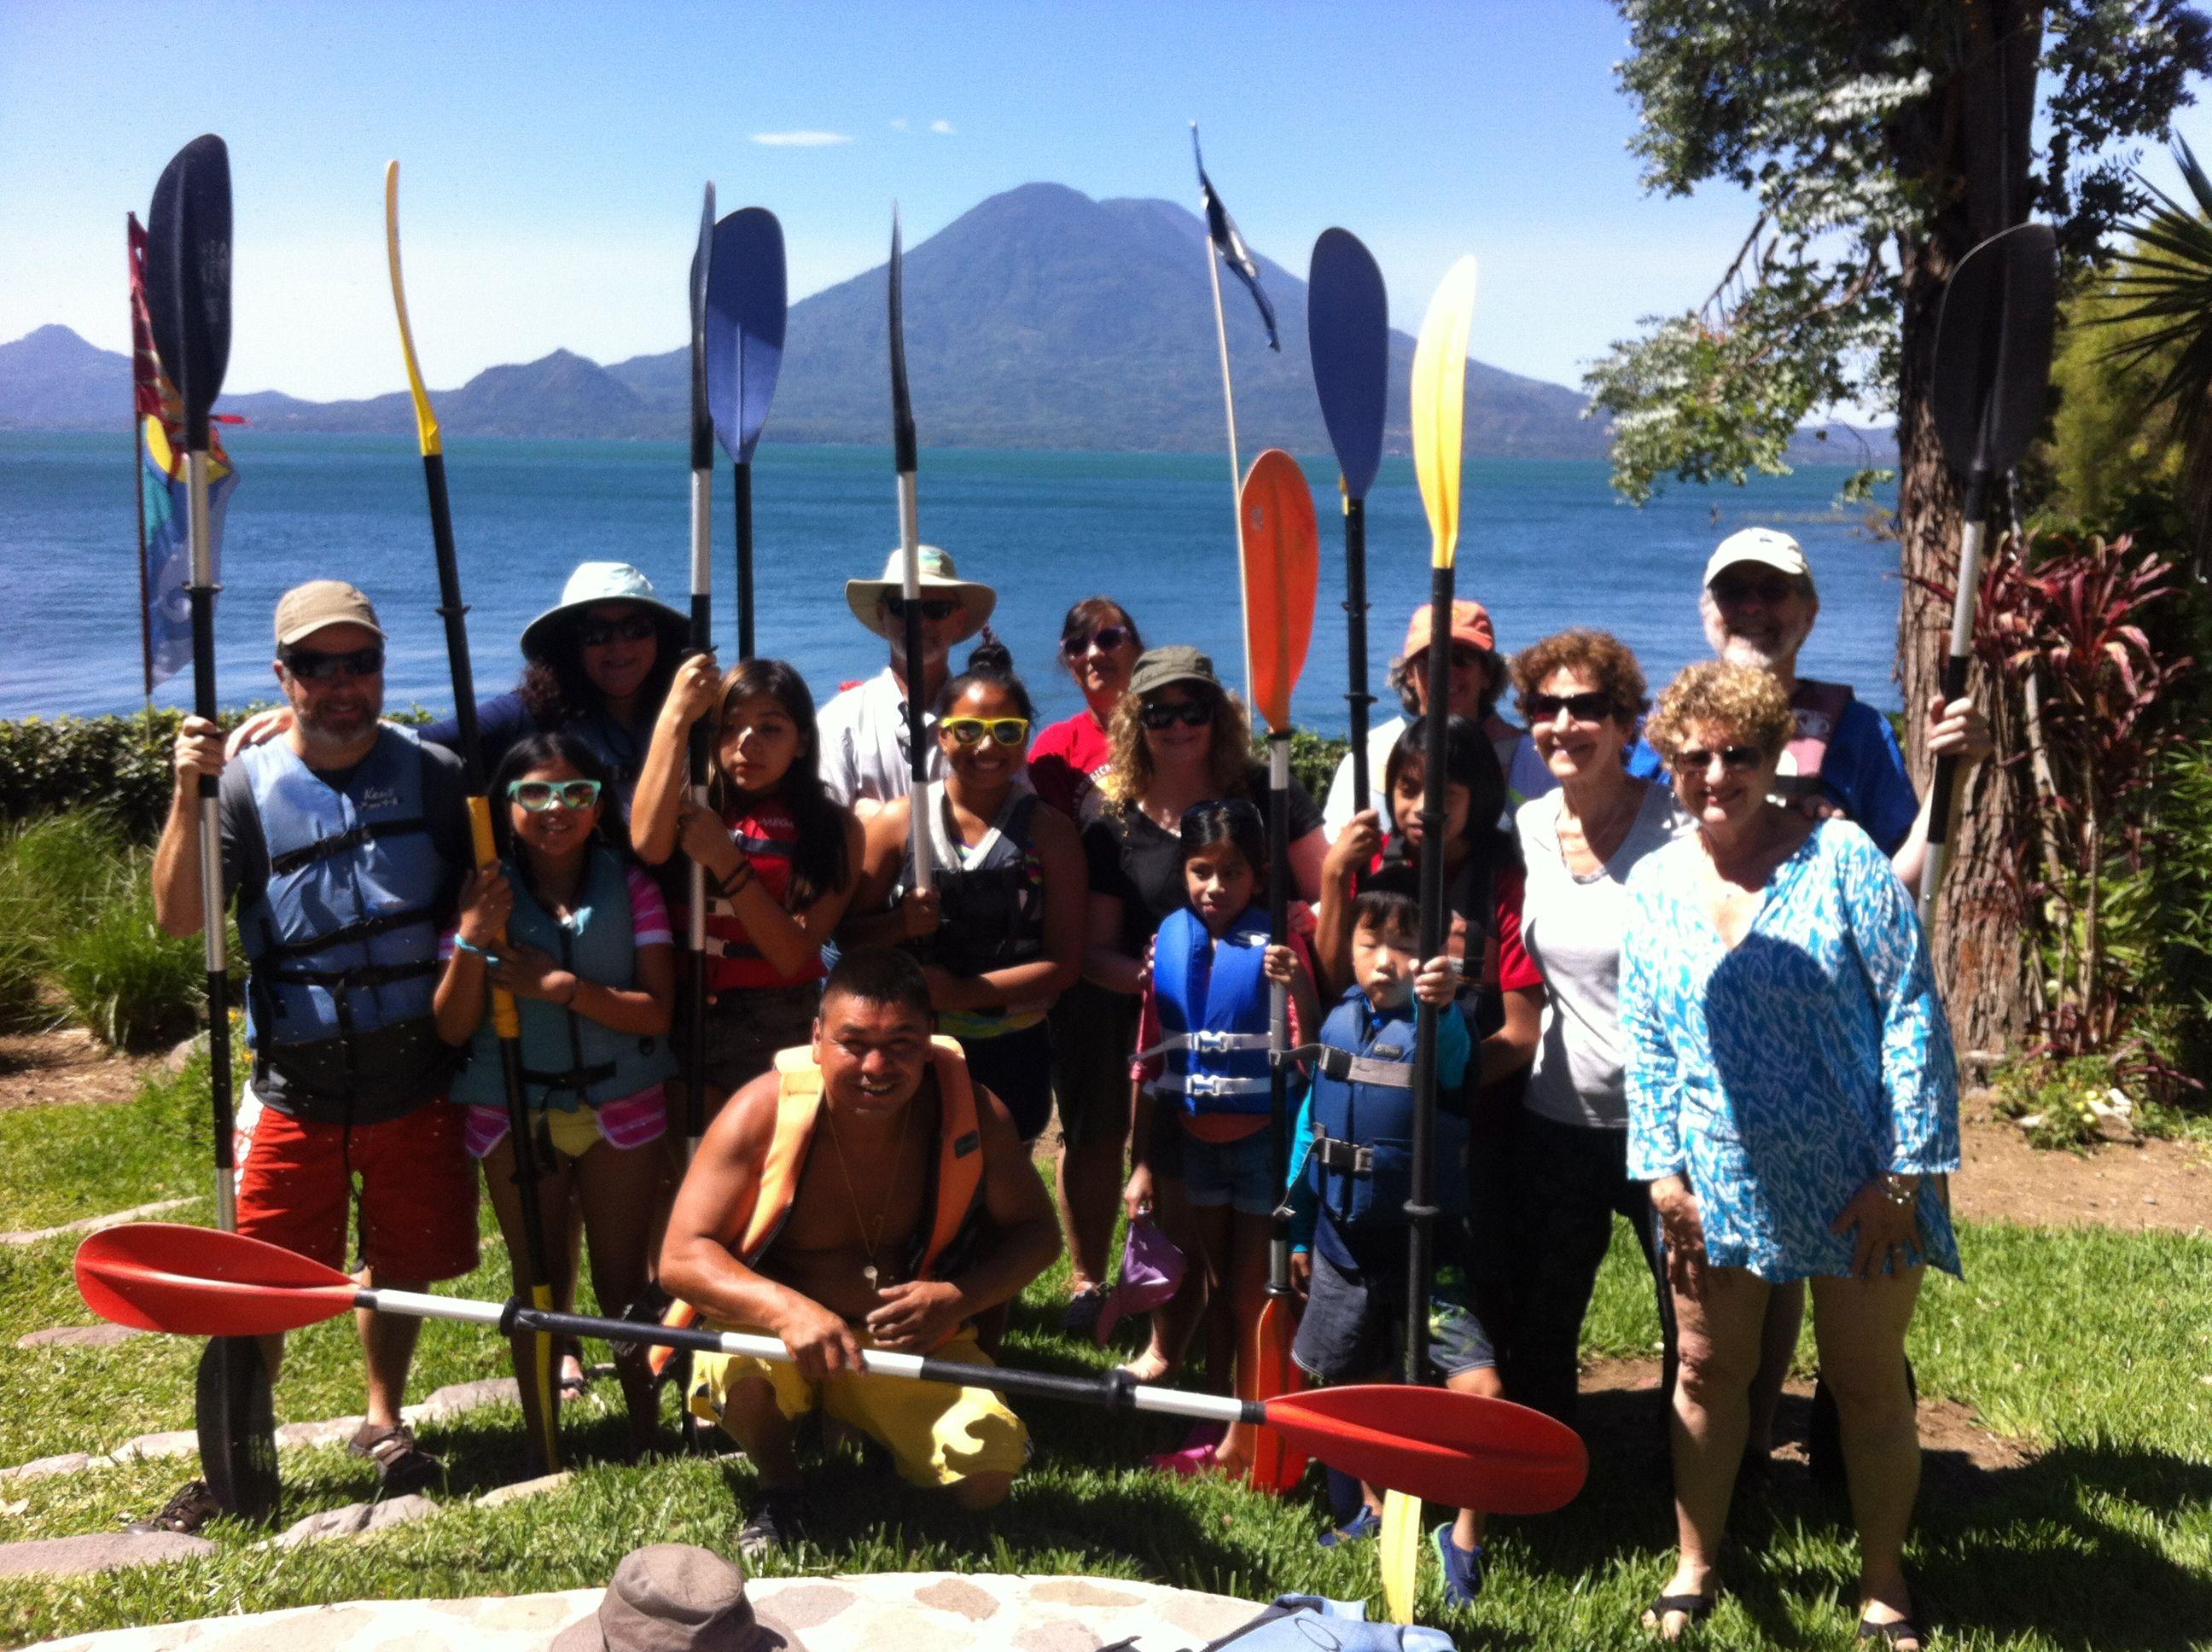 Cliff Jump - Kayak - Archery - Fun Adventure activity - Lake Atitlan